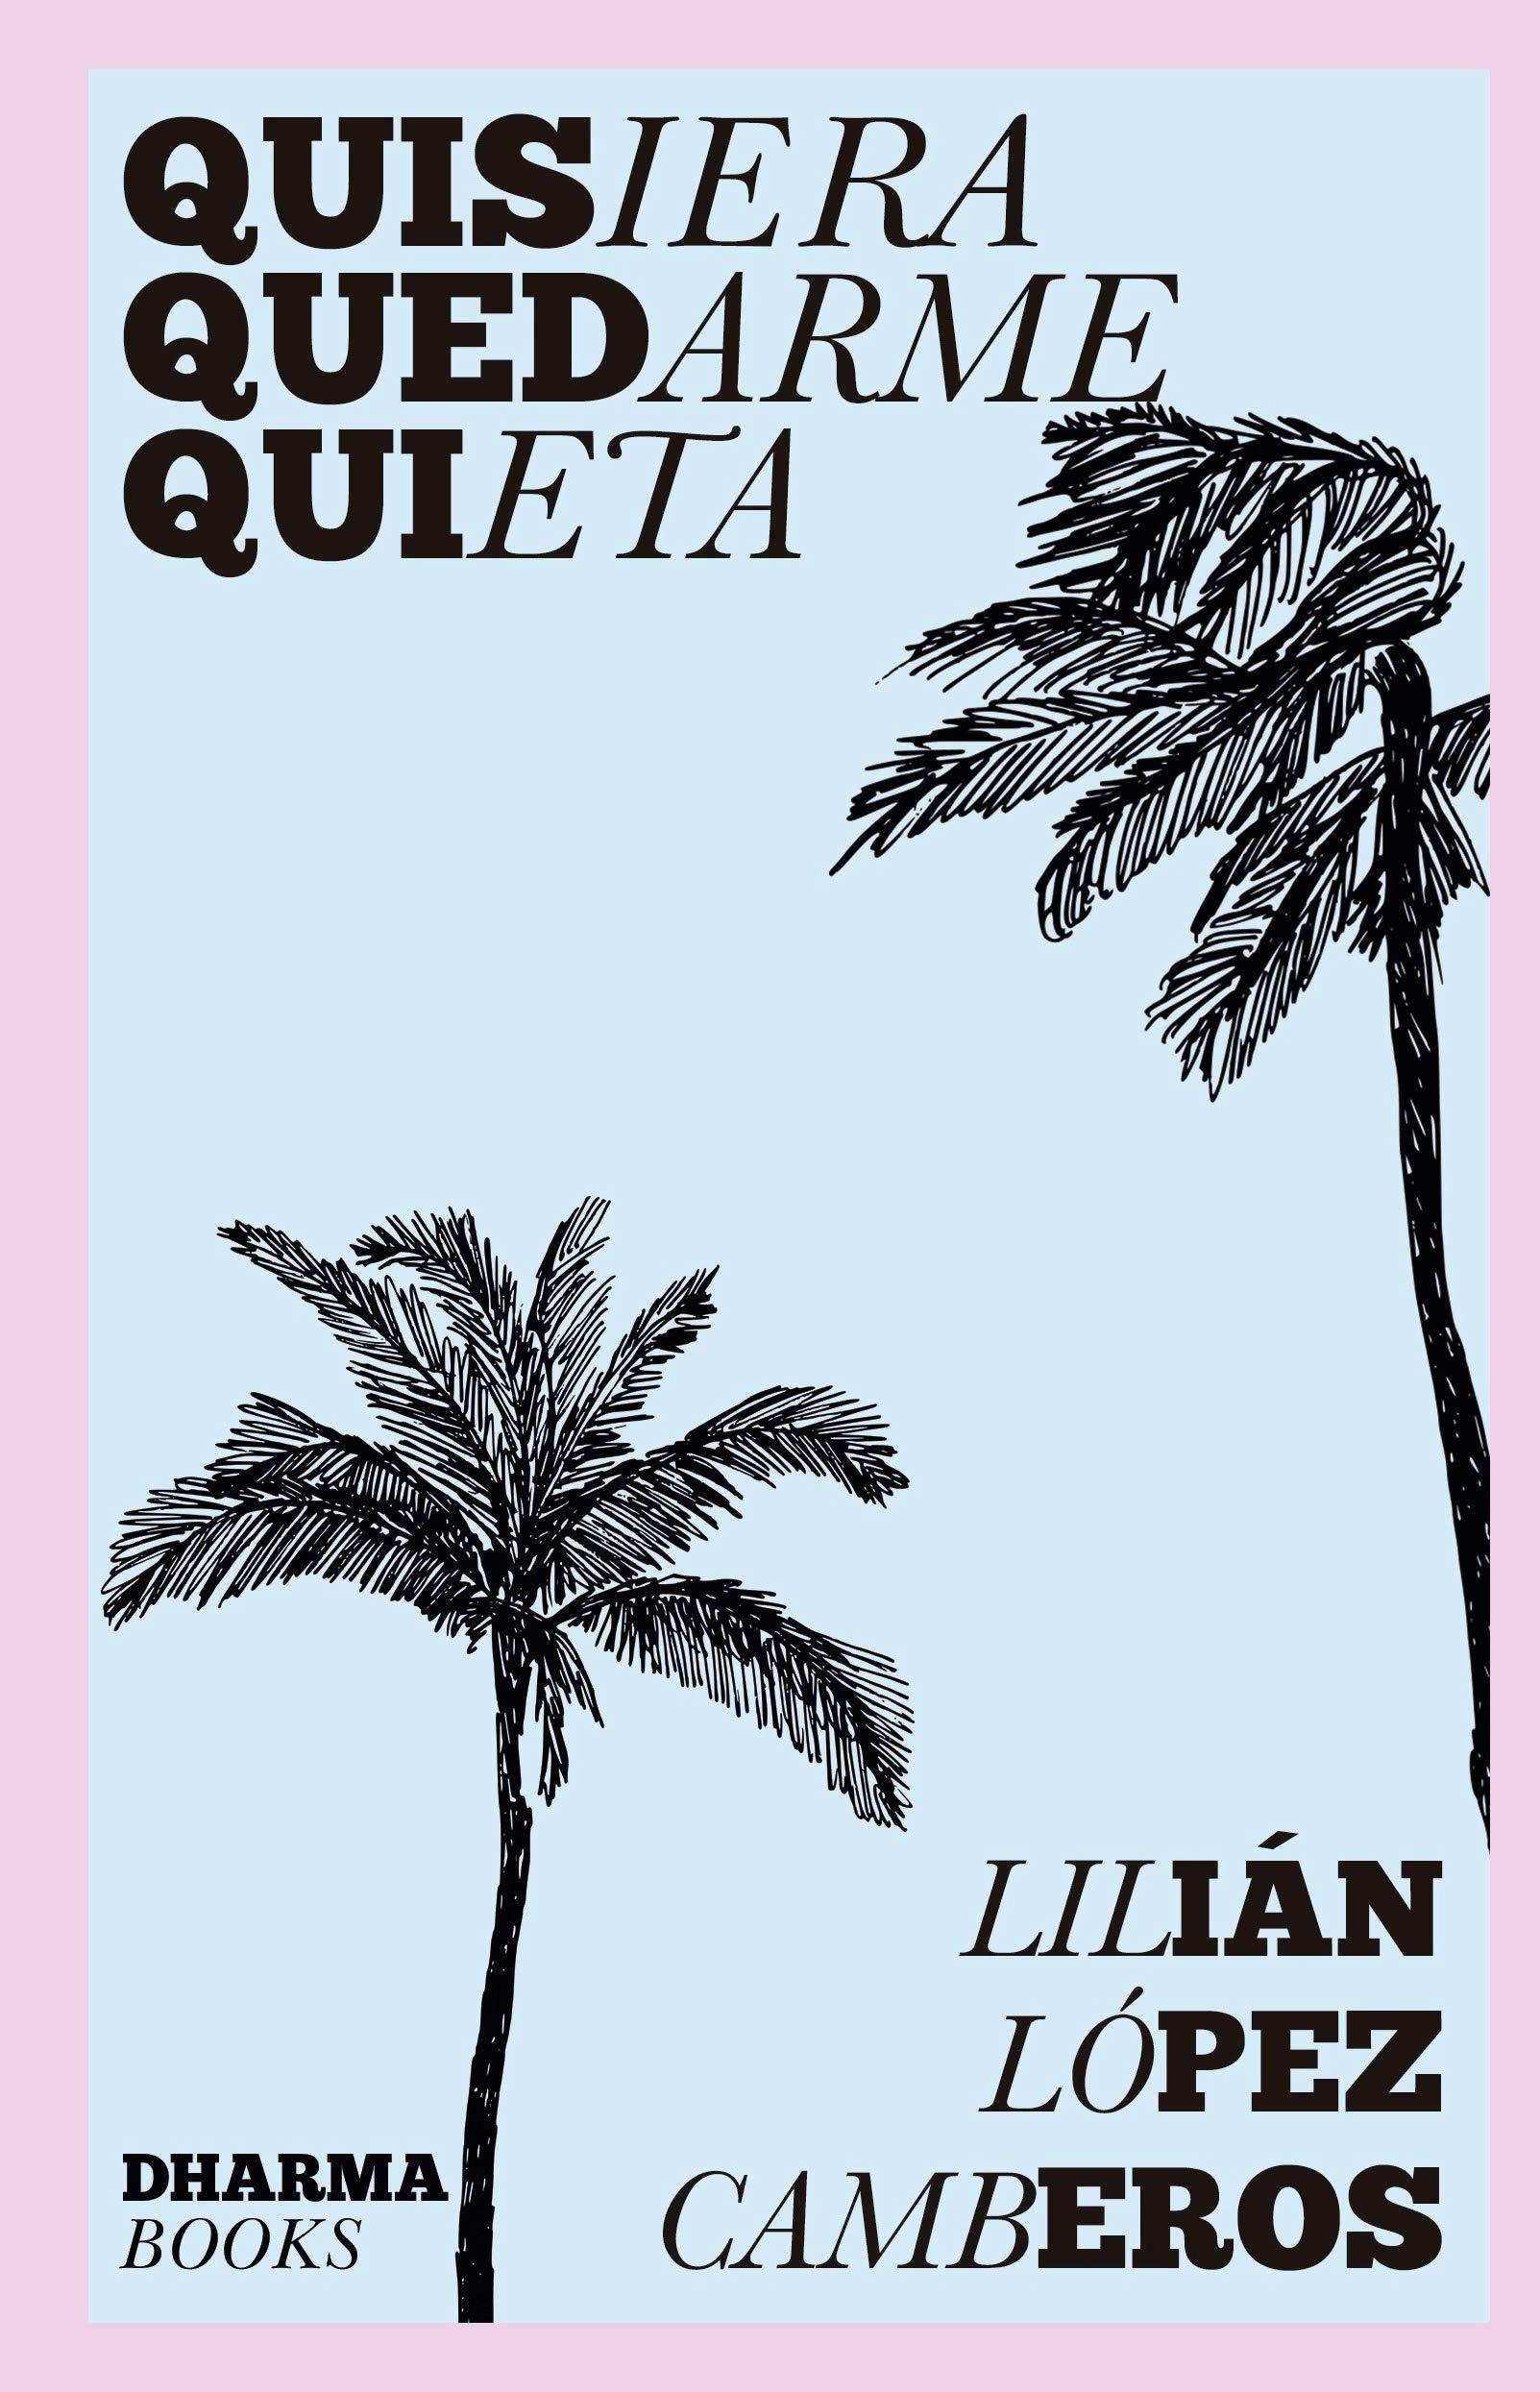 Quisiera quedarme quieta: Lilian López Camberos: Amazon.com.mx: Libros